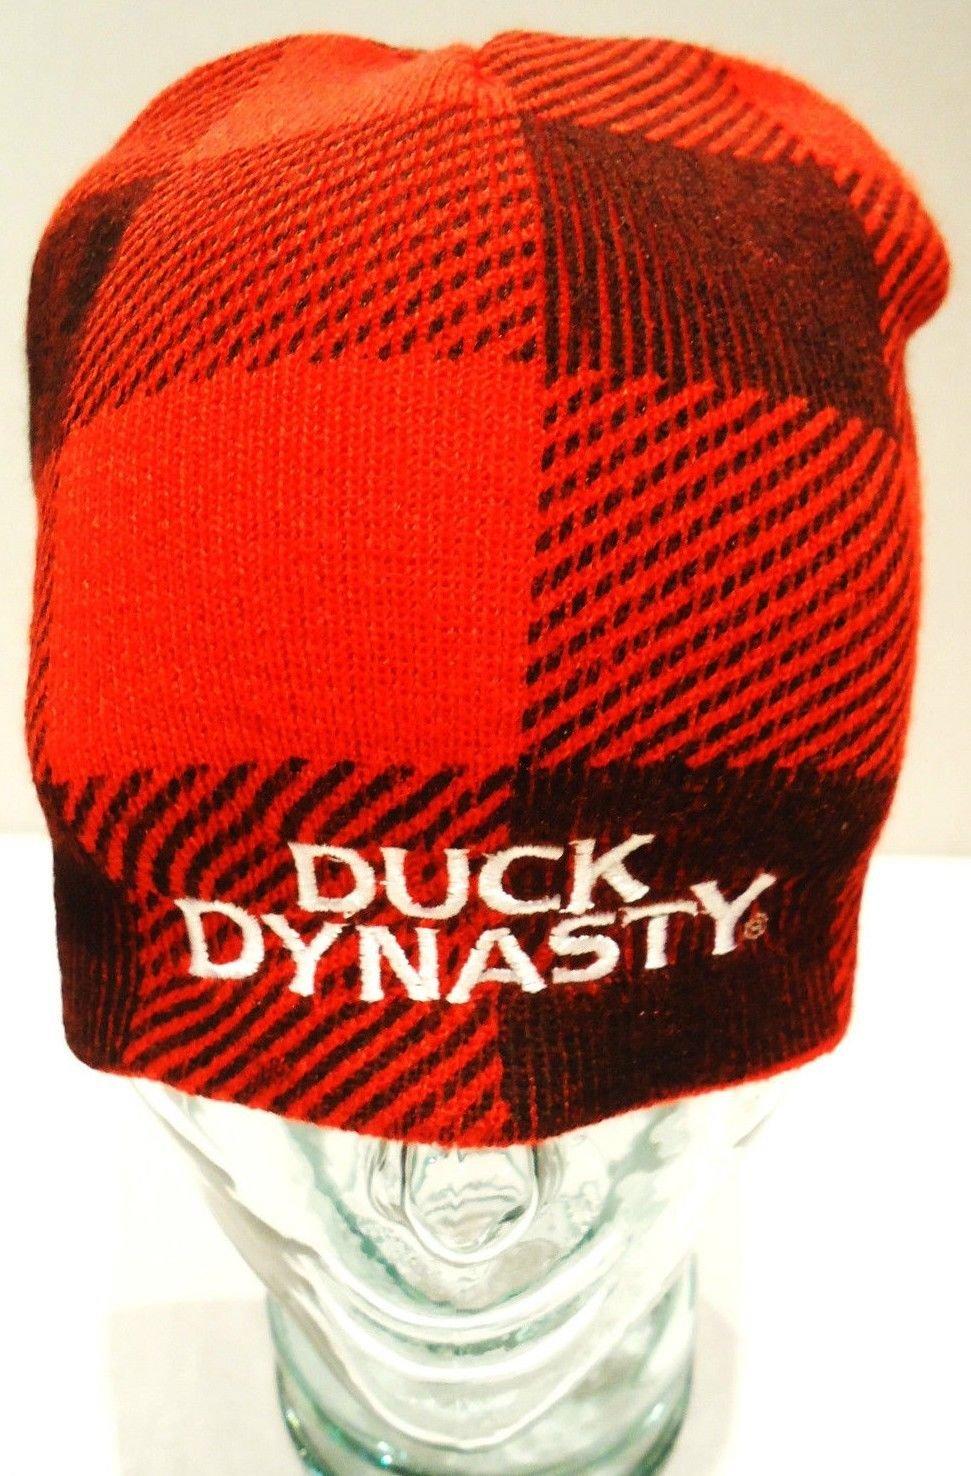 DUCK DYNASTY - PLAID - RED - BLACK - SKULL - SKI - BEANIE - CAP - HAT - NEW